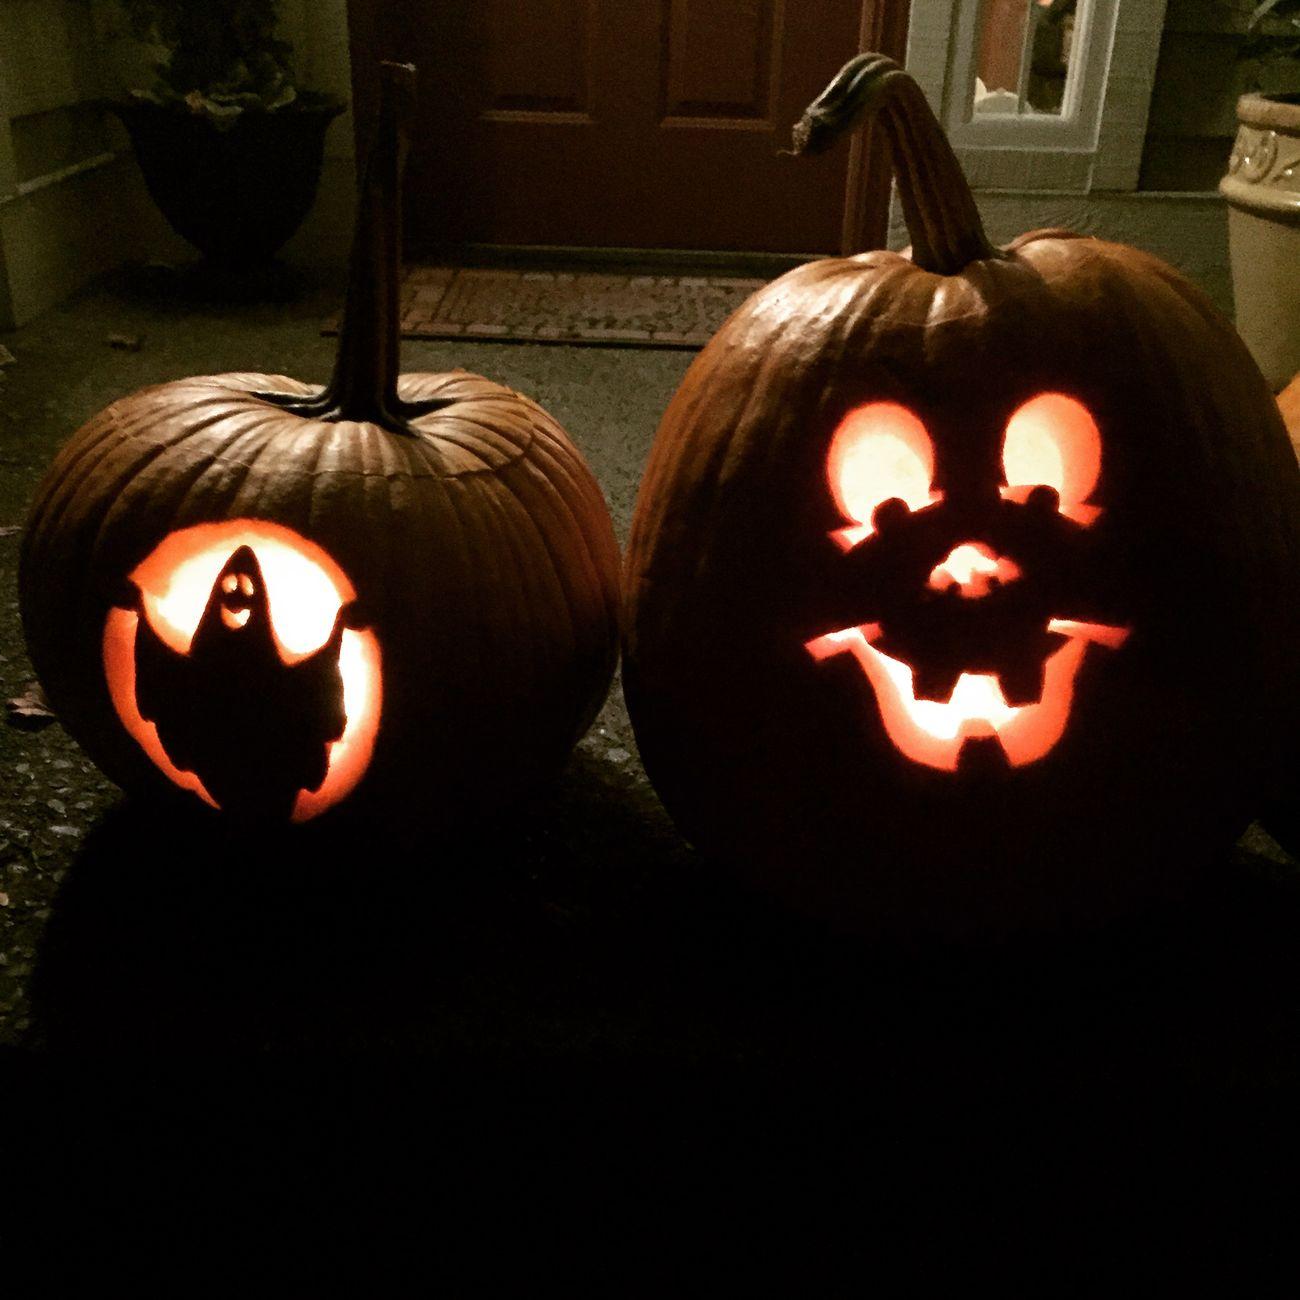 Happy Halloween Jackolantern Pumpkins Pumpkin!Pumpkin! Pumpkin Carving Pumpkinpatch Thegreatpumpkin Allhallowseve